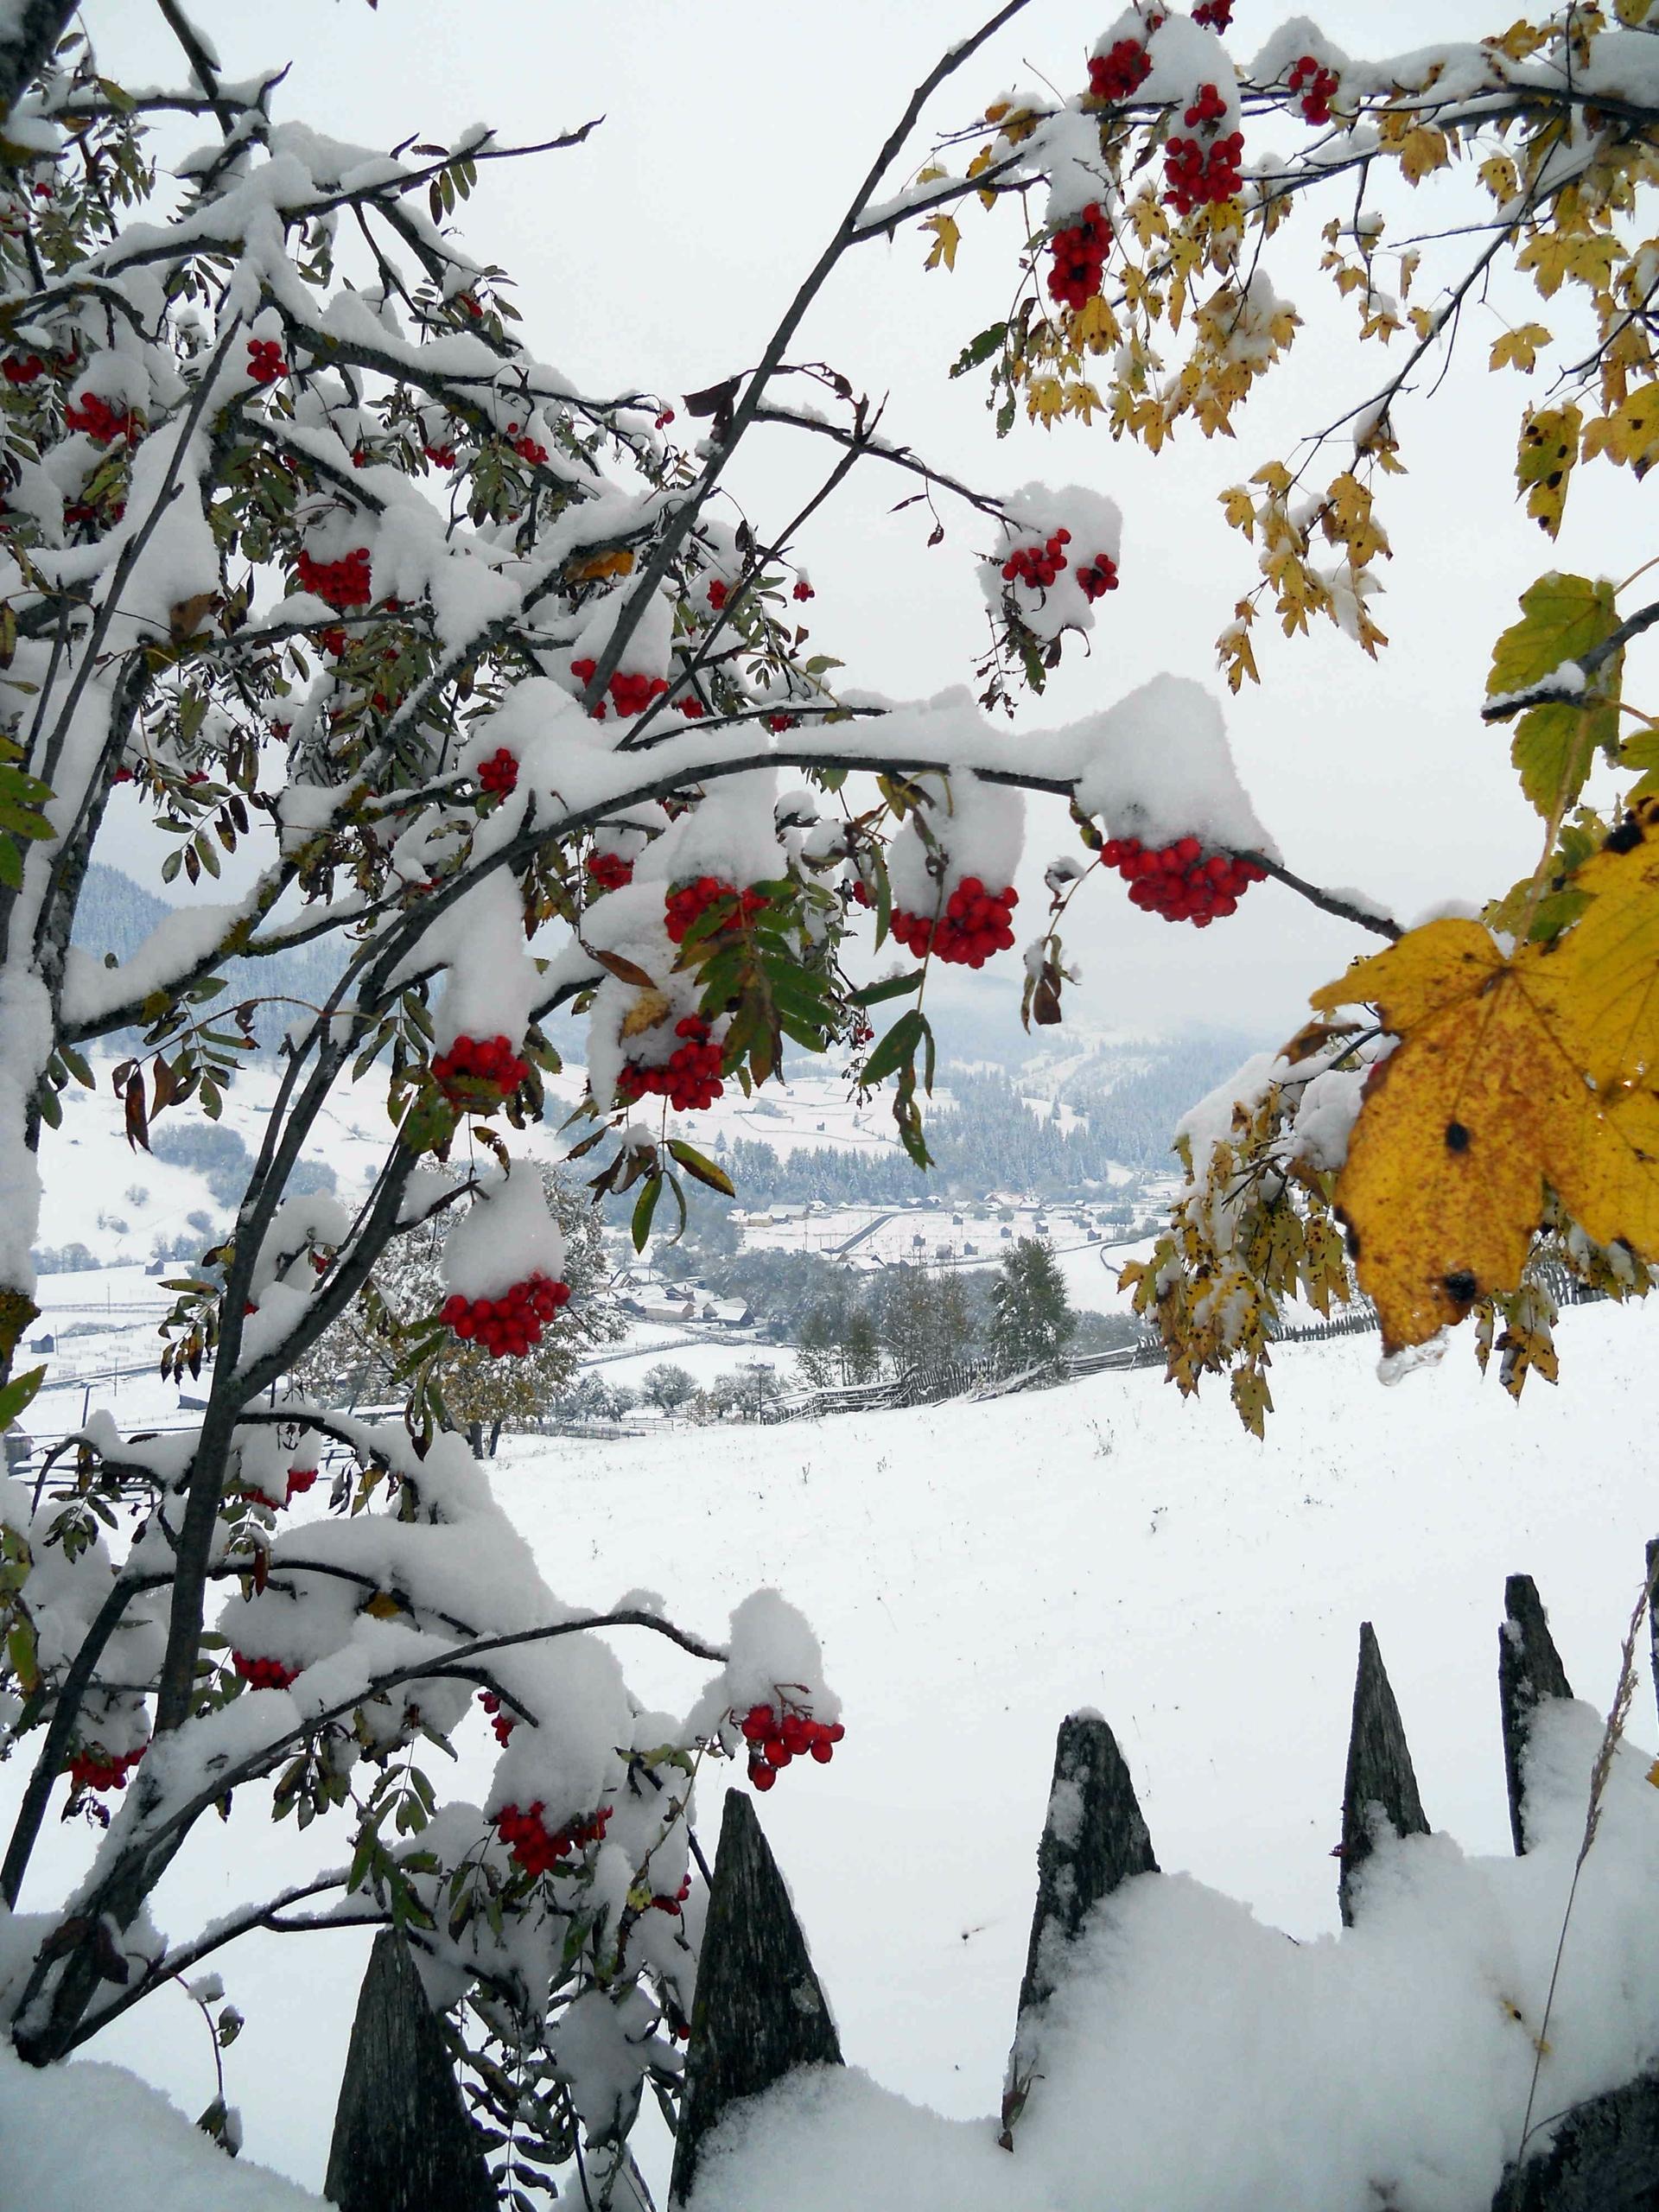 Rowan tree wintry glee - rowan, winter - fondator | ello